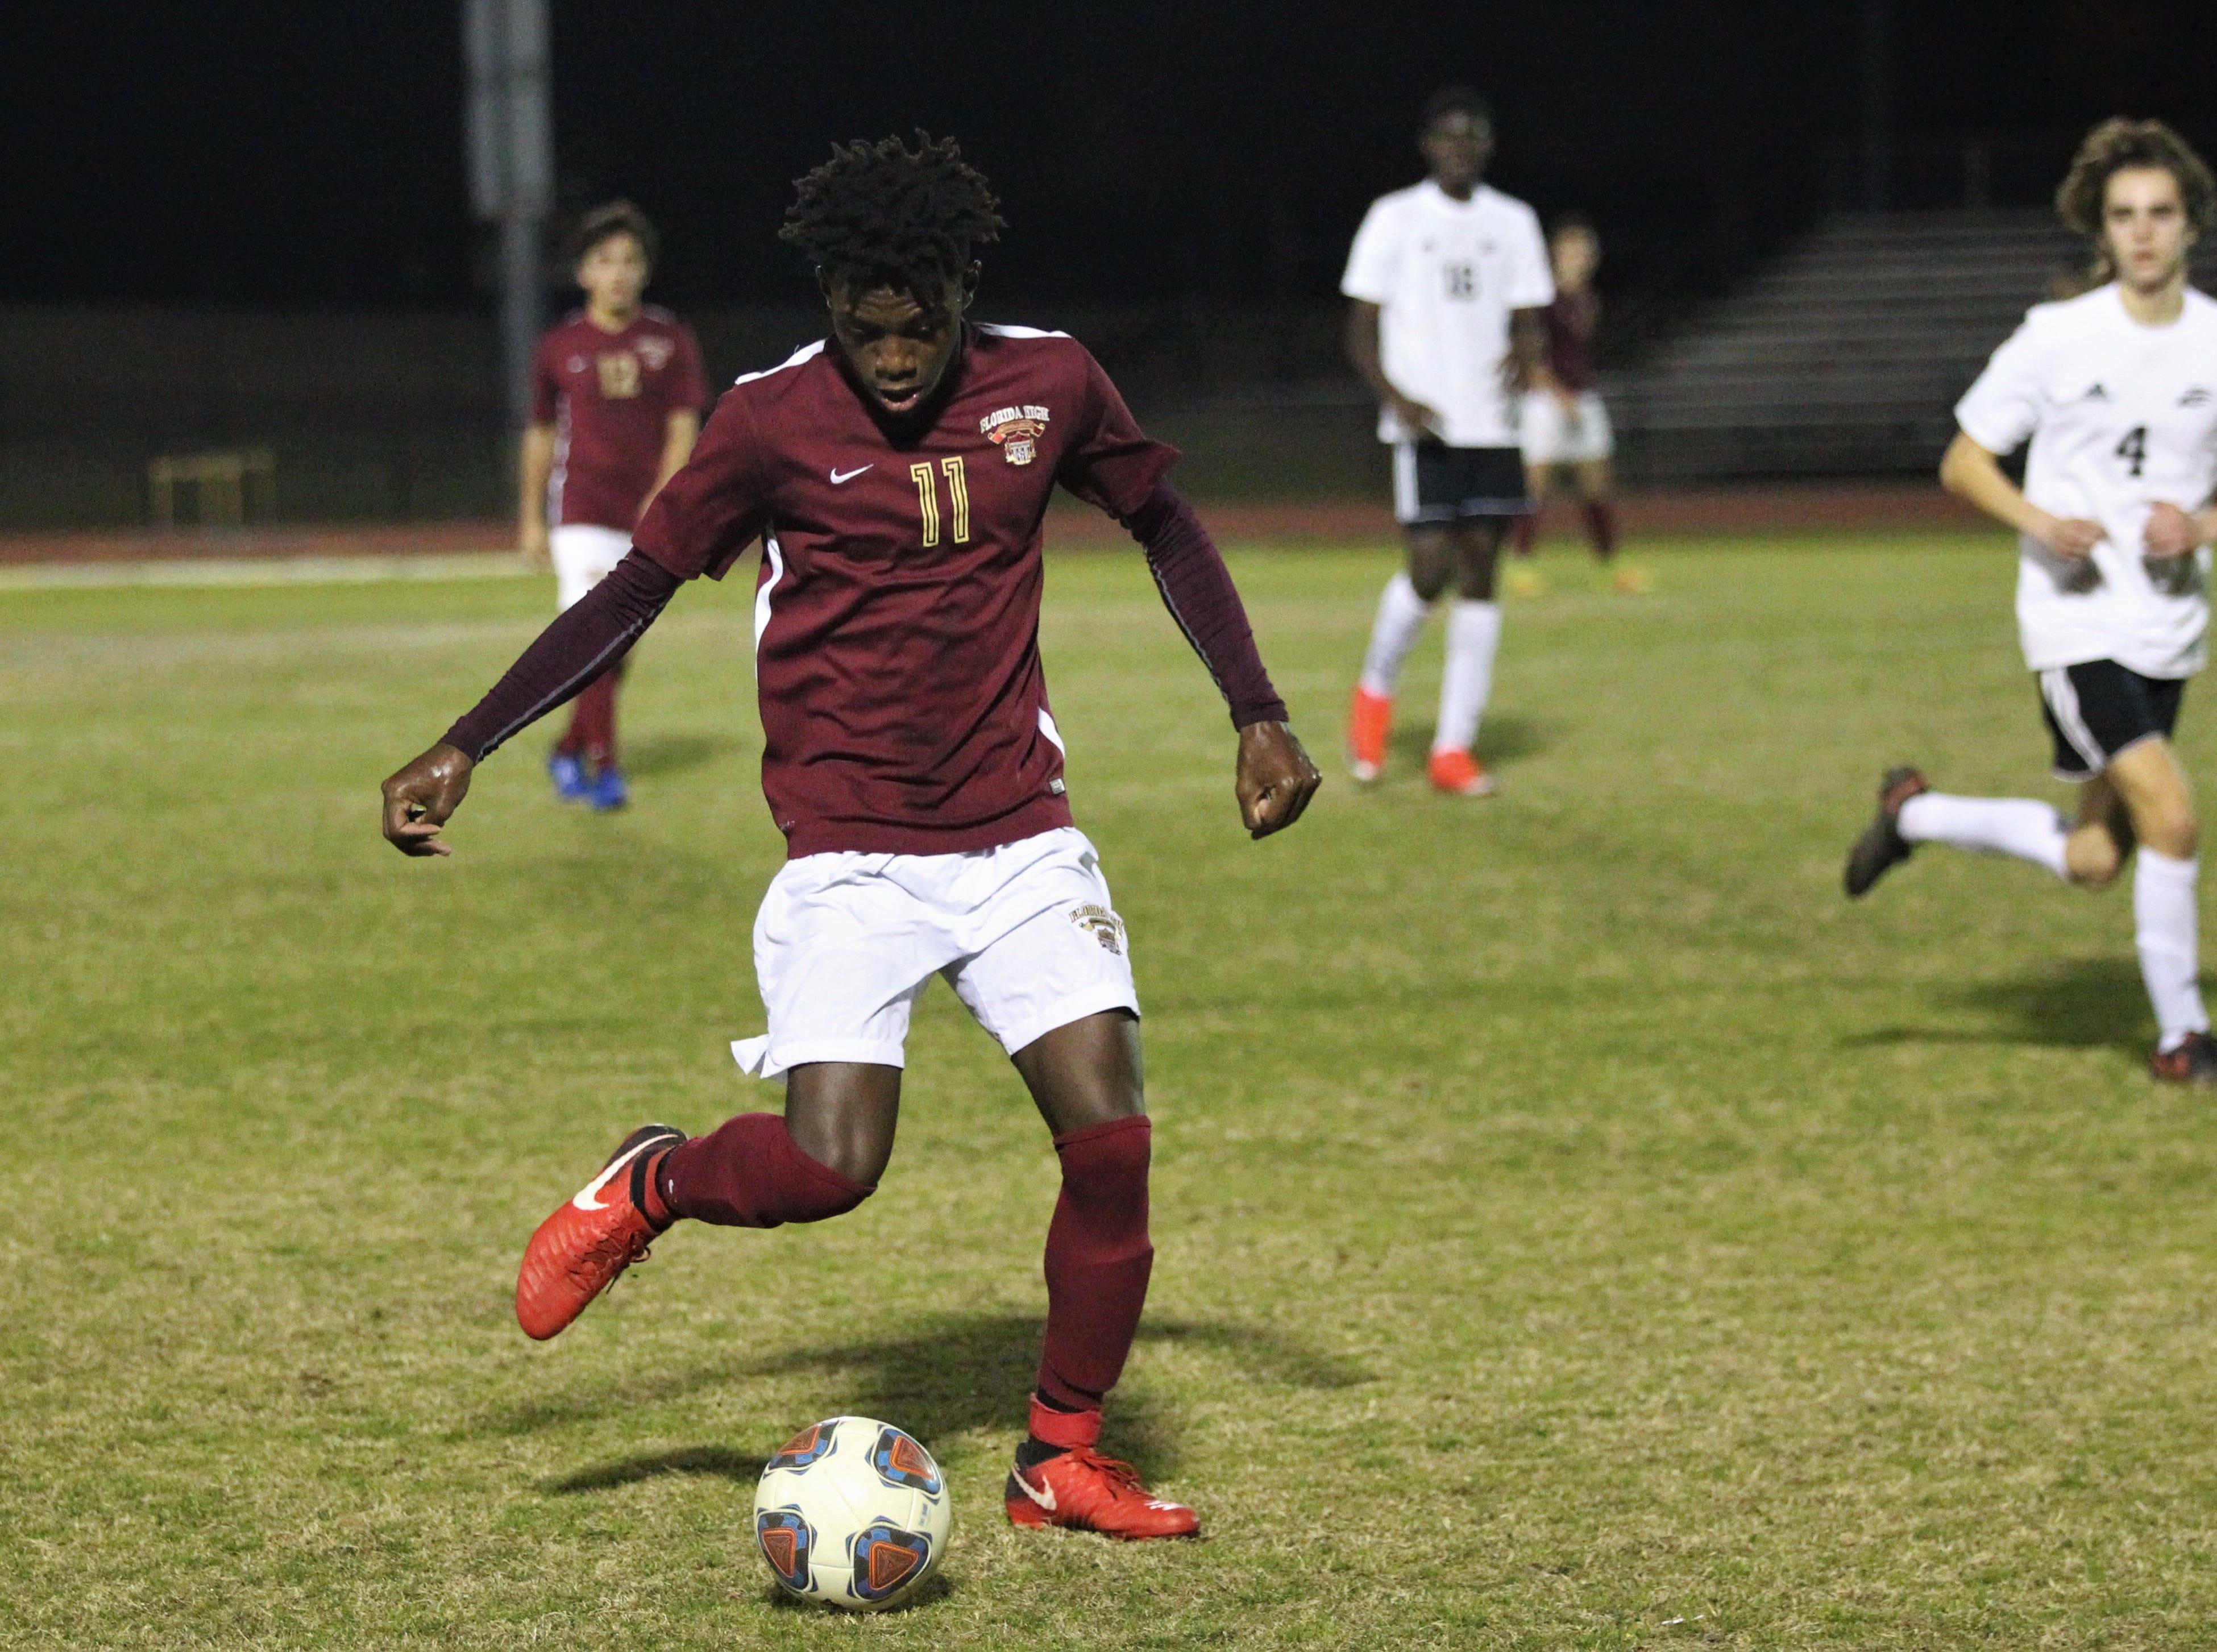 Florida High's Zuri Robertson makes a pass ahead as Florida High's boys soccer team beat South Walton 2-0 during a Region 1-2A quarterfinal on Feb. 6, 2018.